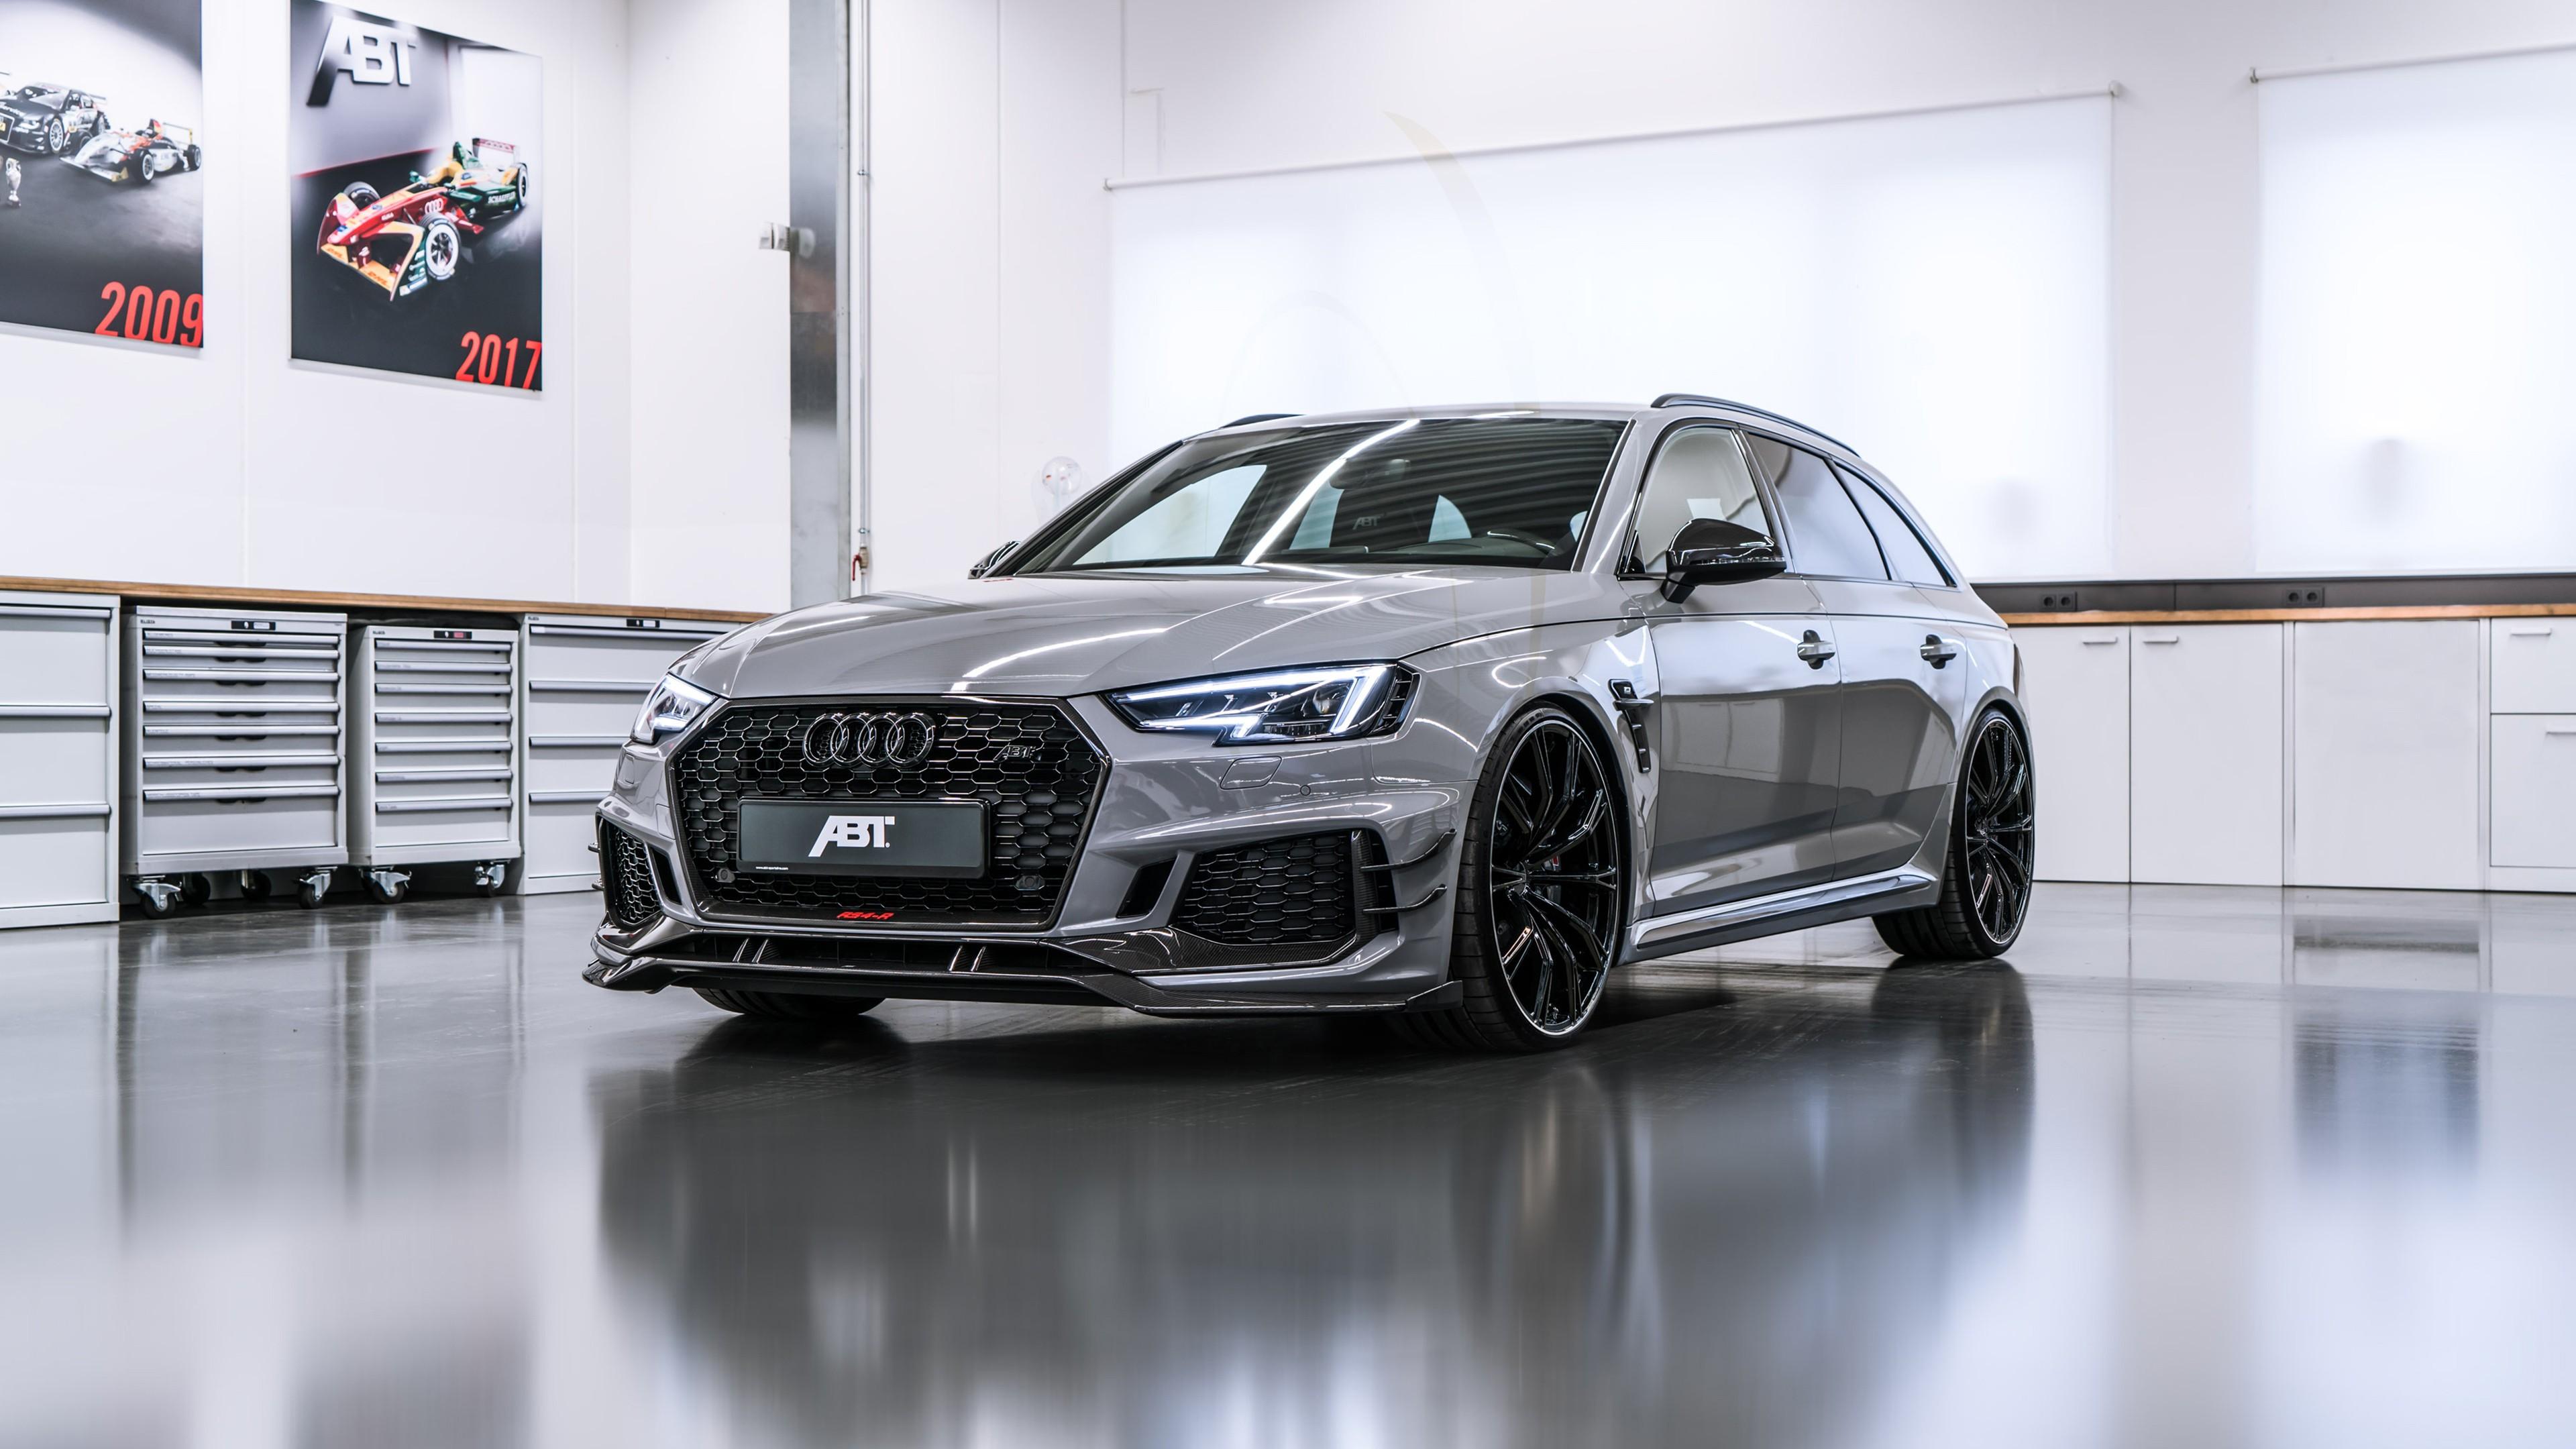 2018 Abt Audi Rs4 R Avant 4k 4 Wallpaper Hd Car Wallpapers Id 9775